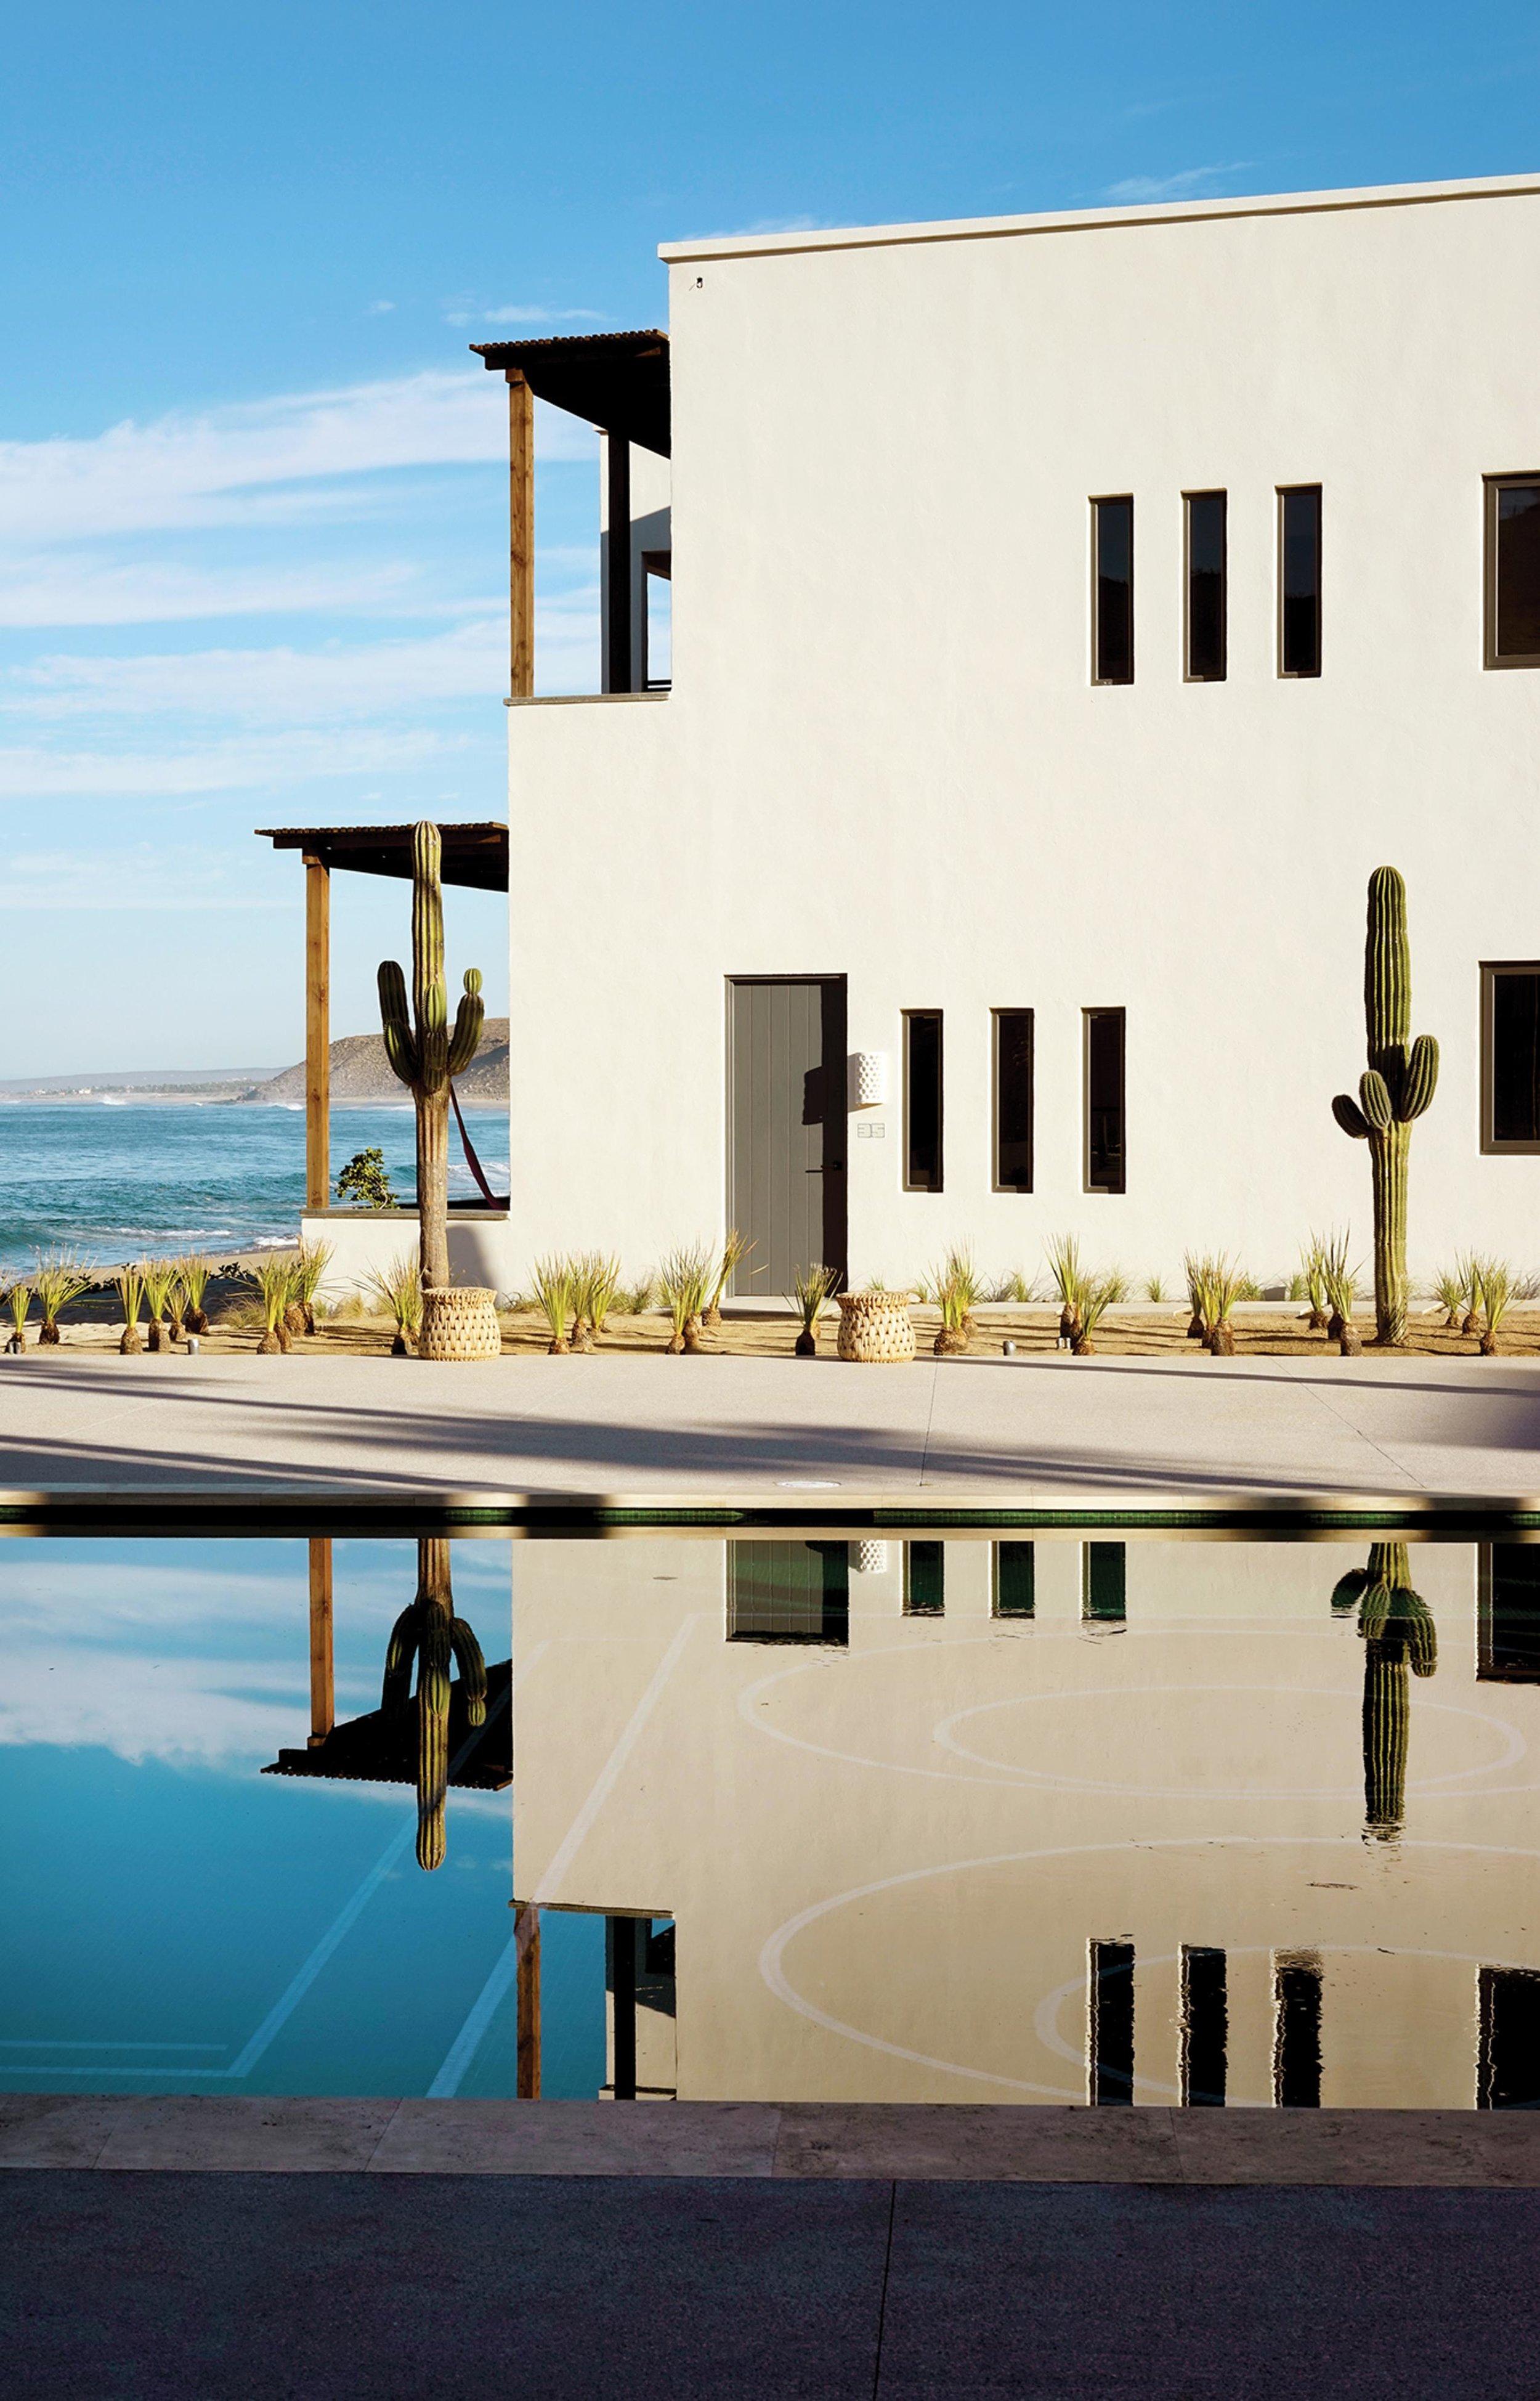 THE LIFE AQUATIC | The pool area of Hotel San Cristóbal, which overlooks Playa Punta Lobos. Photo: Pia Riverola for WSJ. Magazine